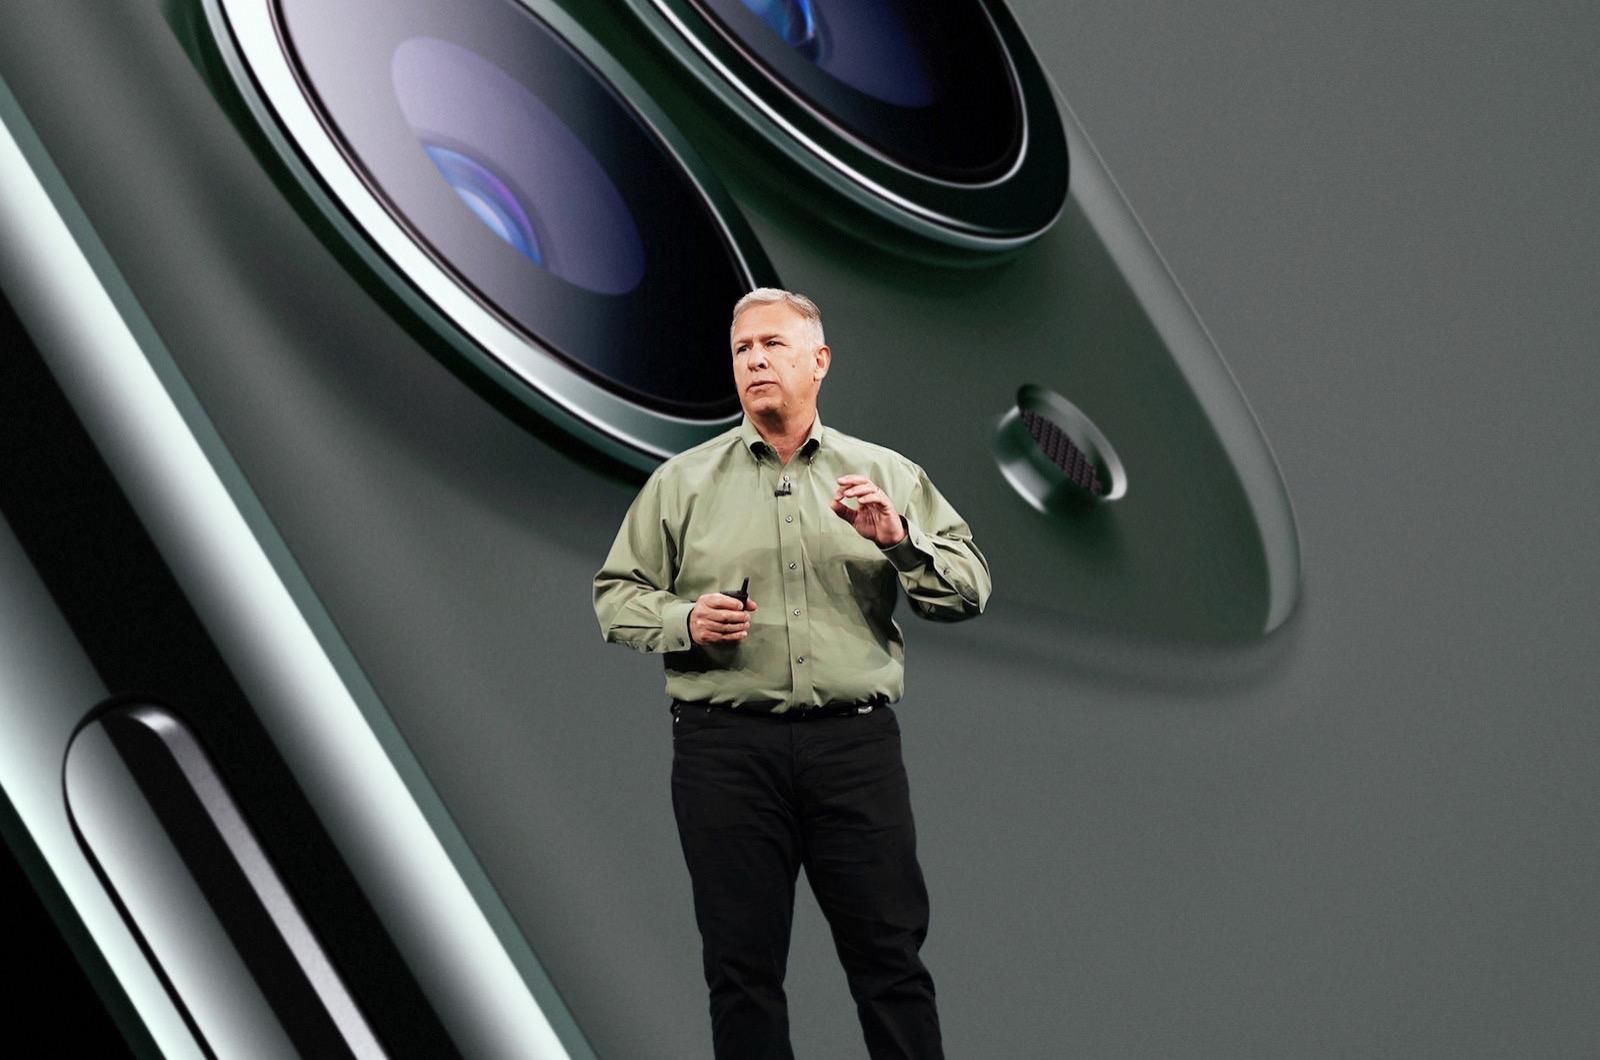 Phil Schiller advances to apple fellow 08042020